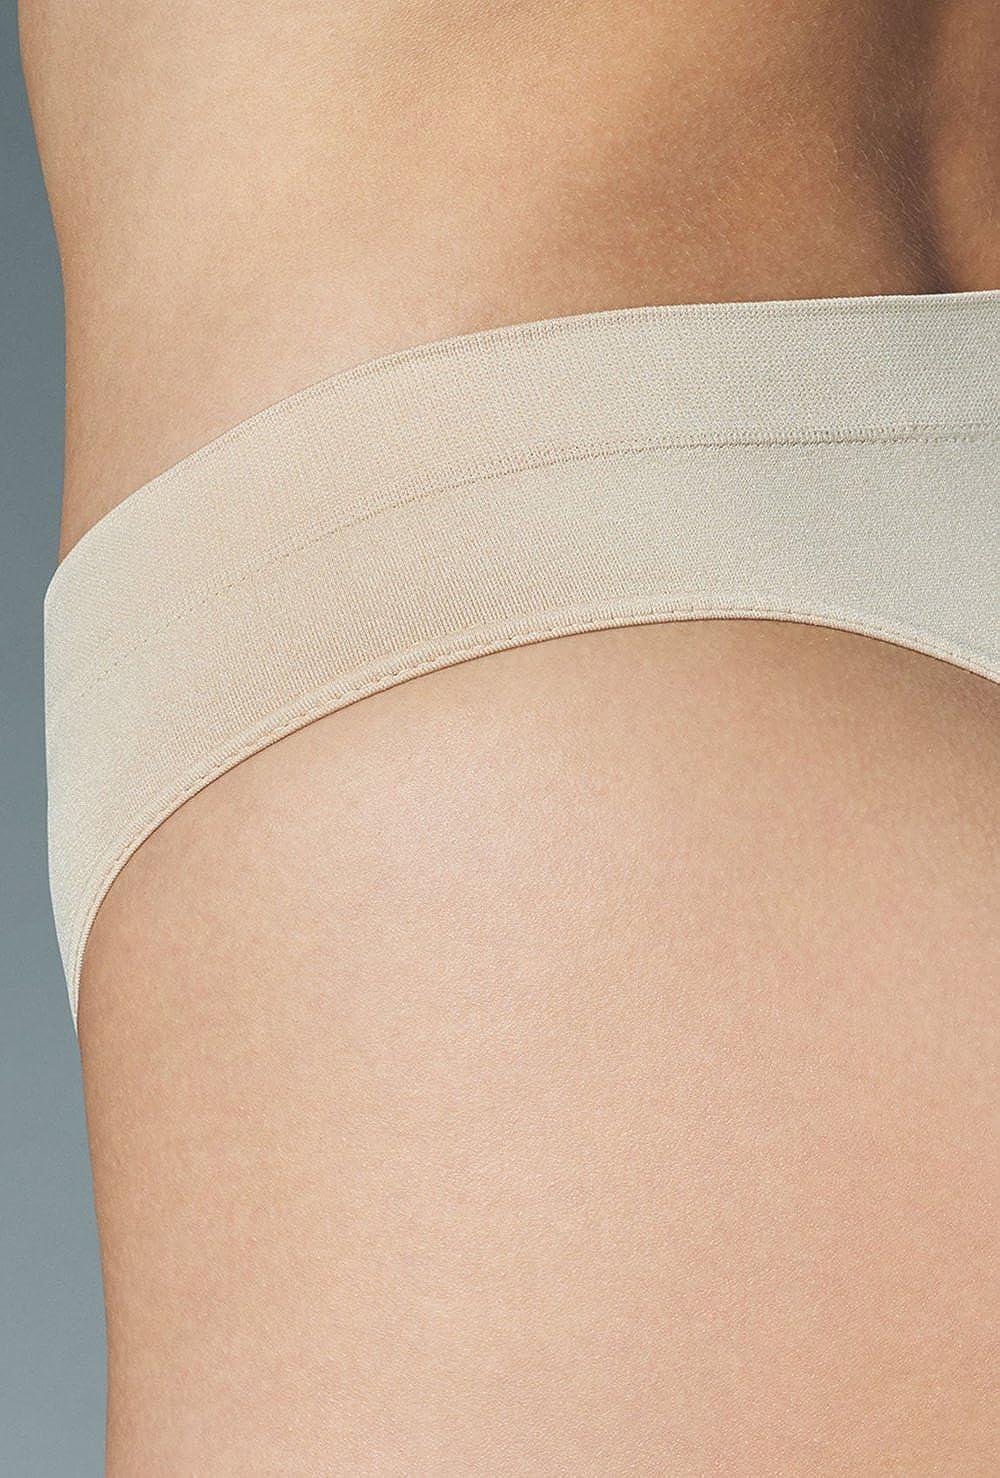 Seamless String//Thong Pack of 3 Gatta String Lili Underwear